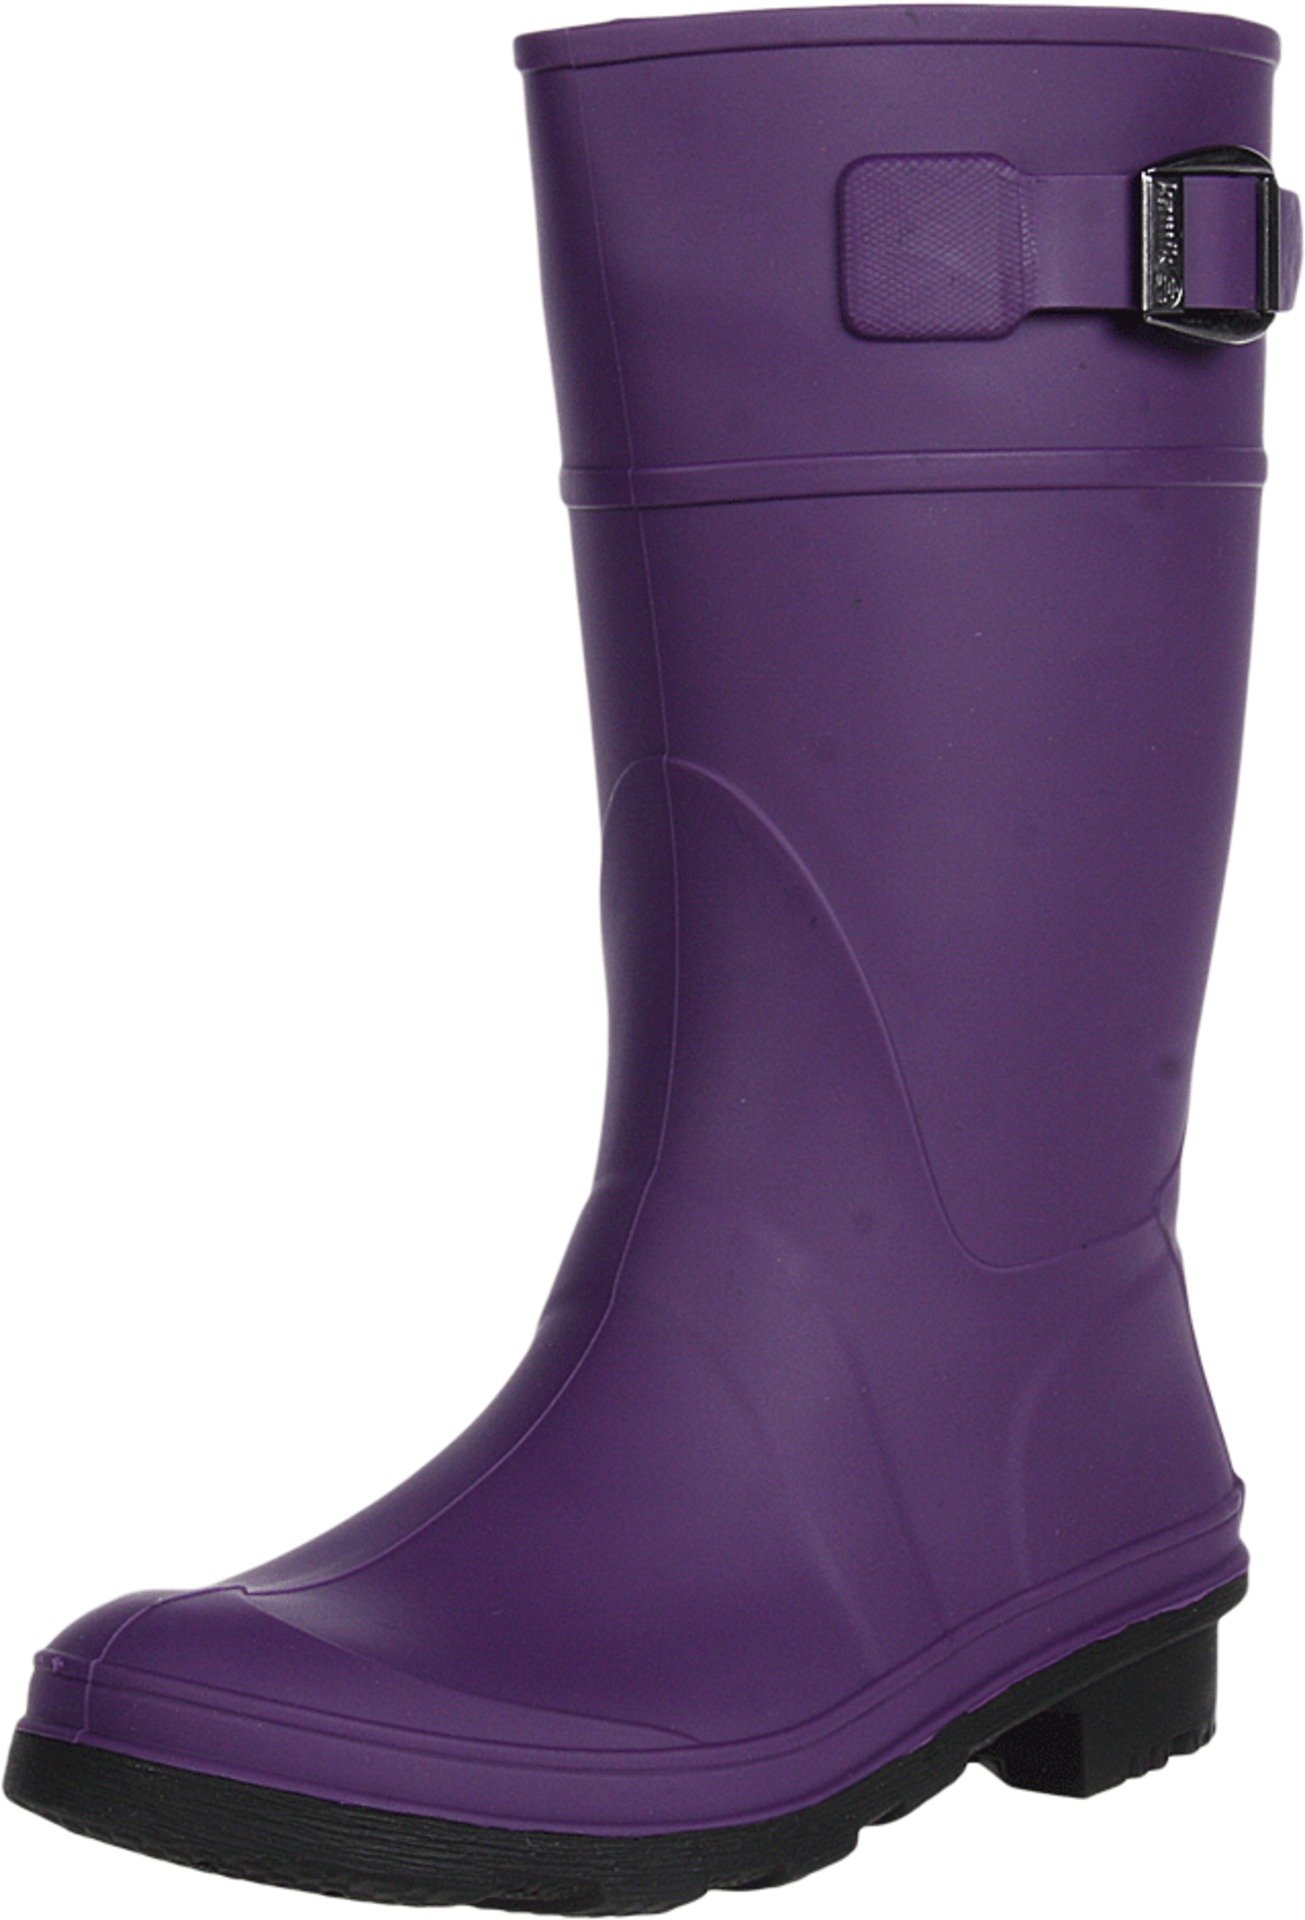 Kamik unisex-child Raindrops Rain Boot,Eggplant,4 M US Big Kid